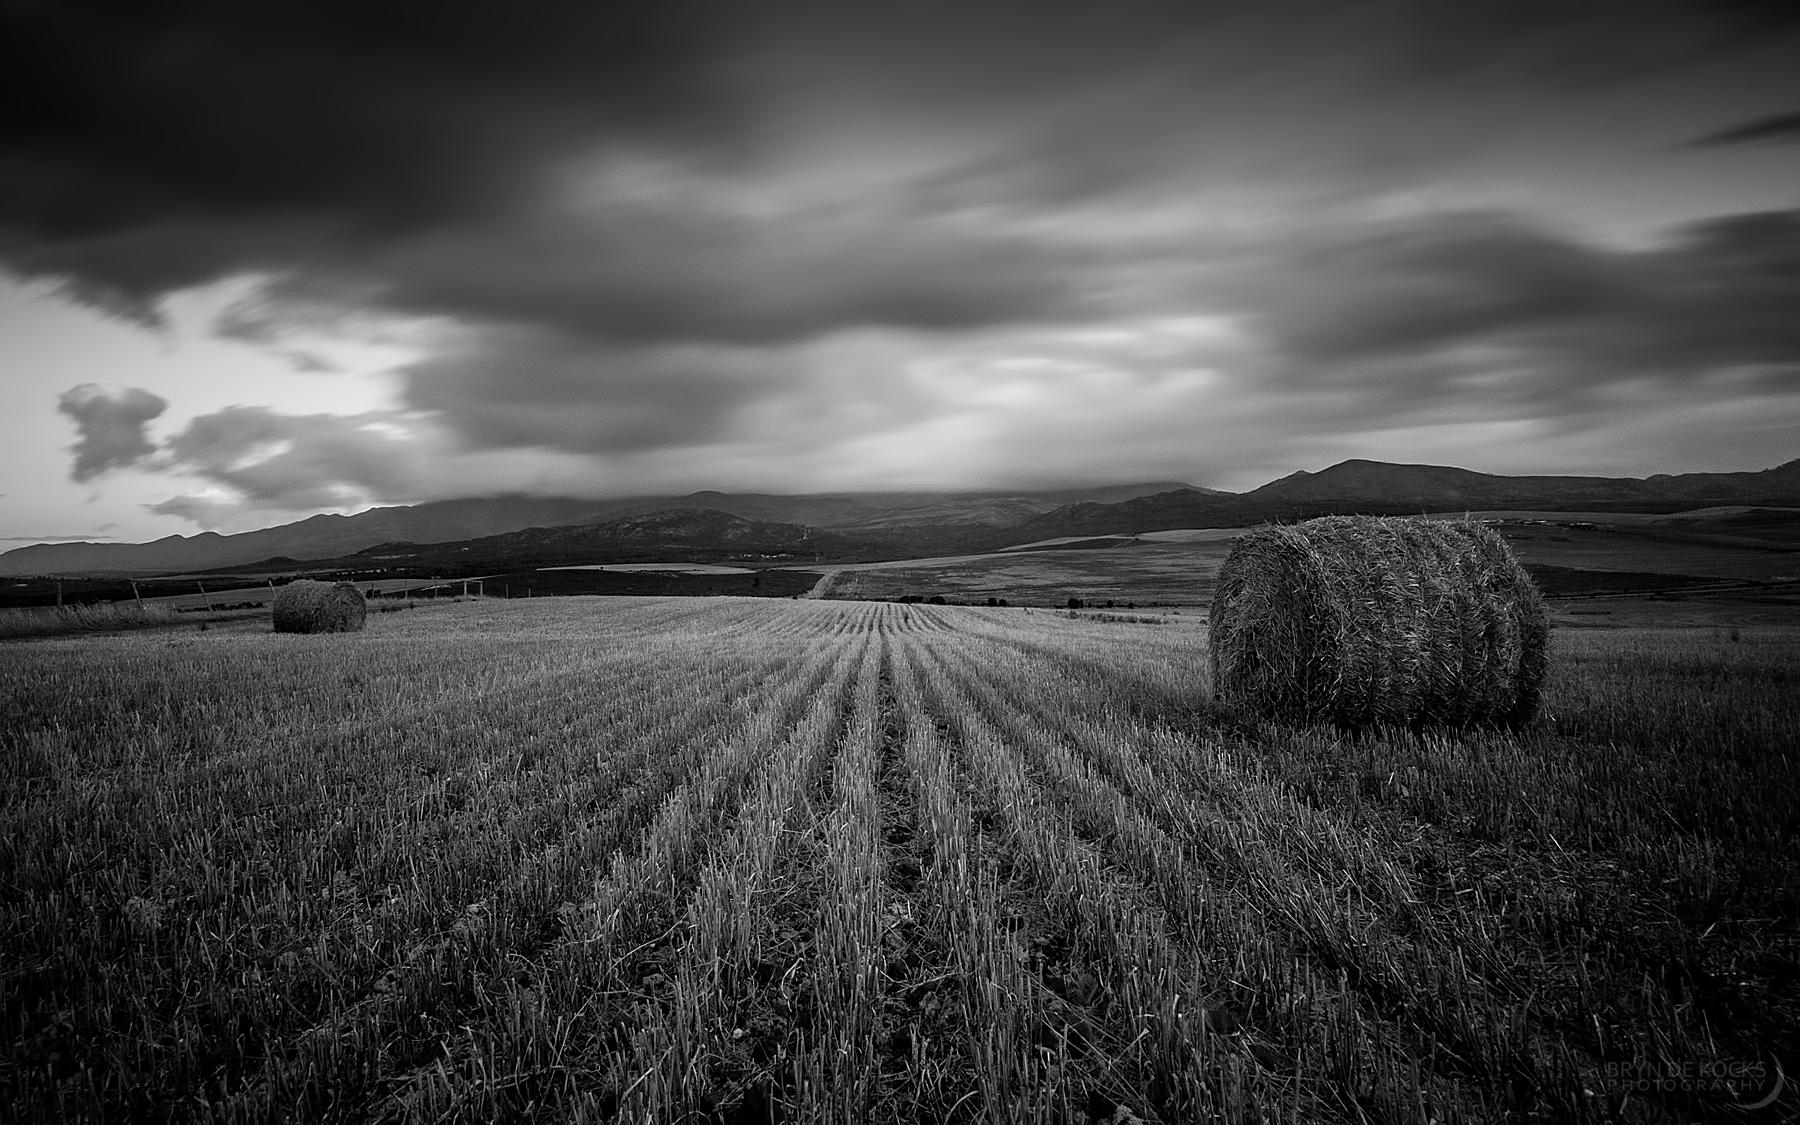 Bails of Hay Near Botrivier